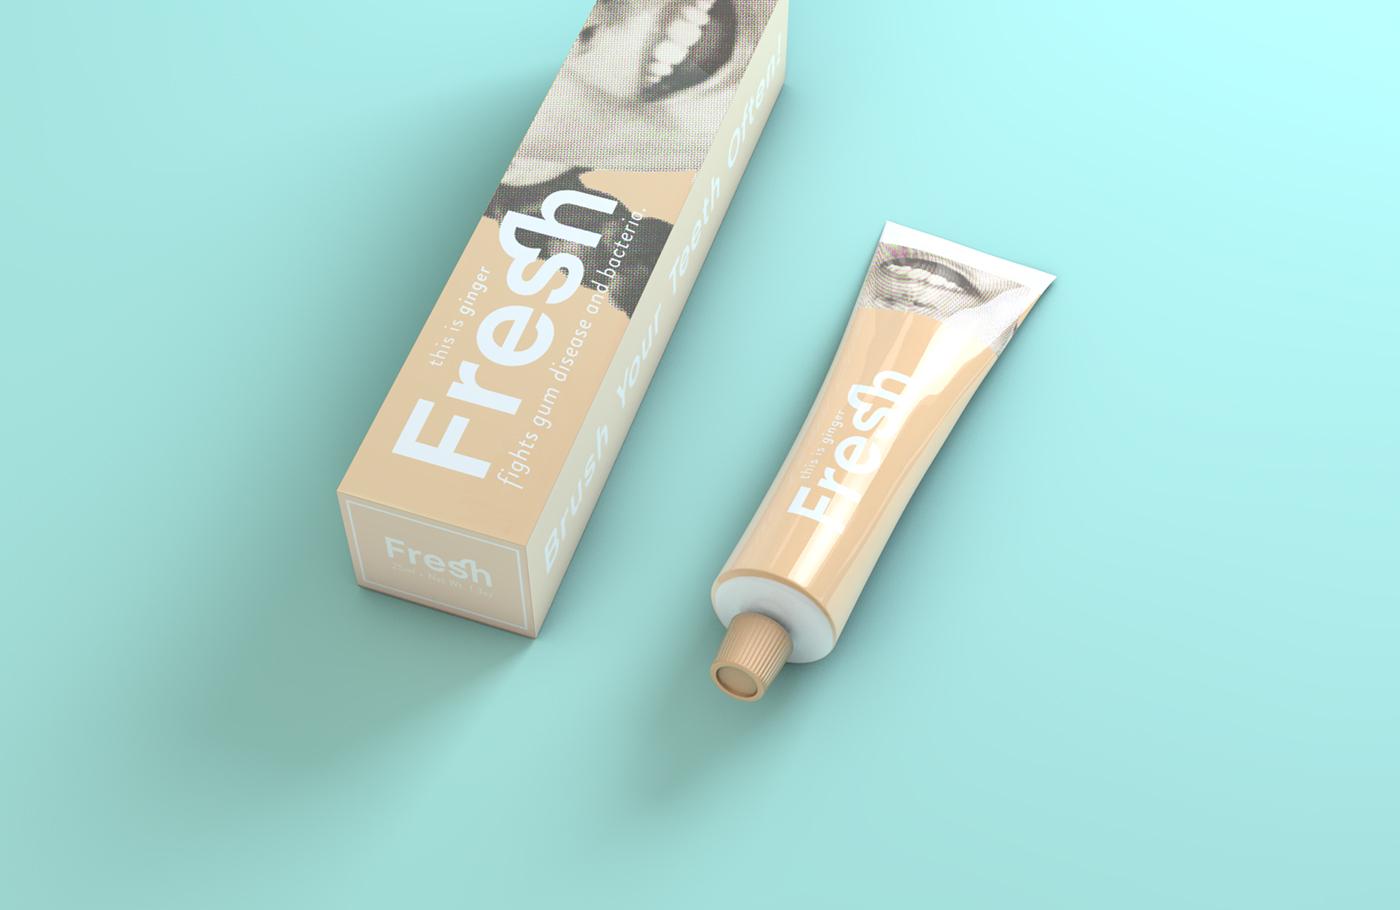 fresh-toothpaste